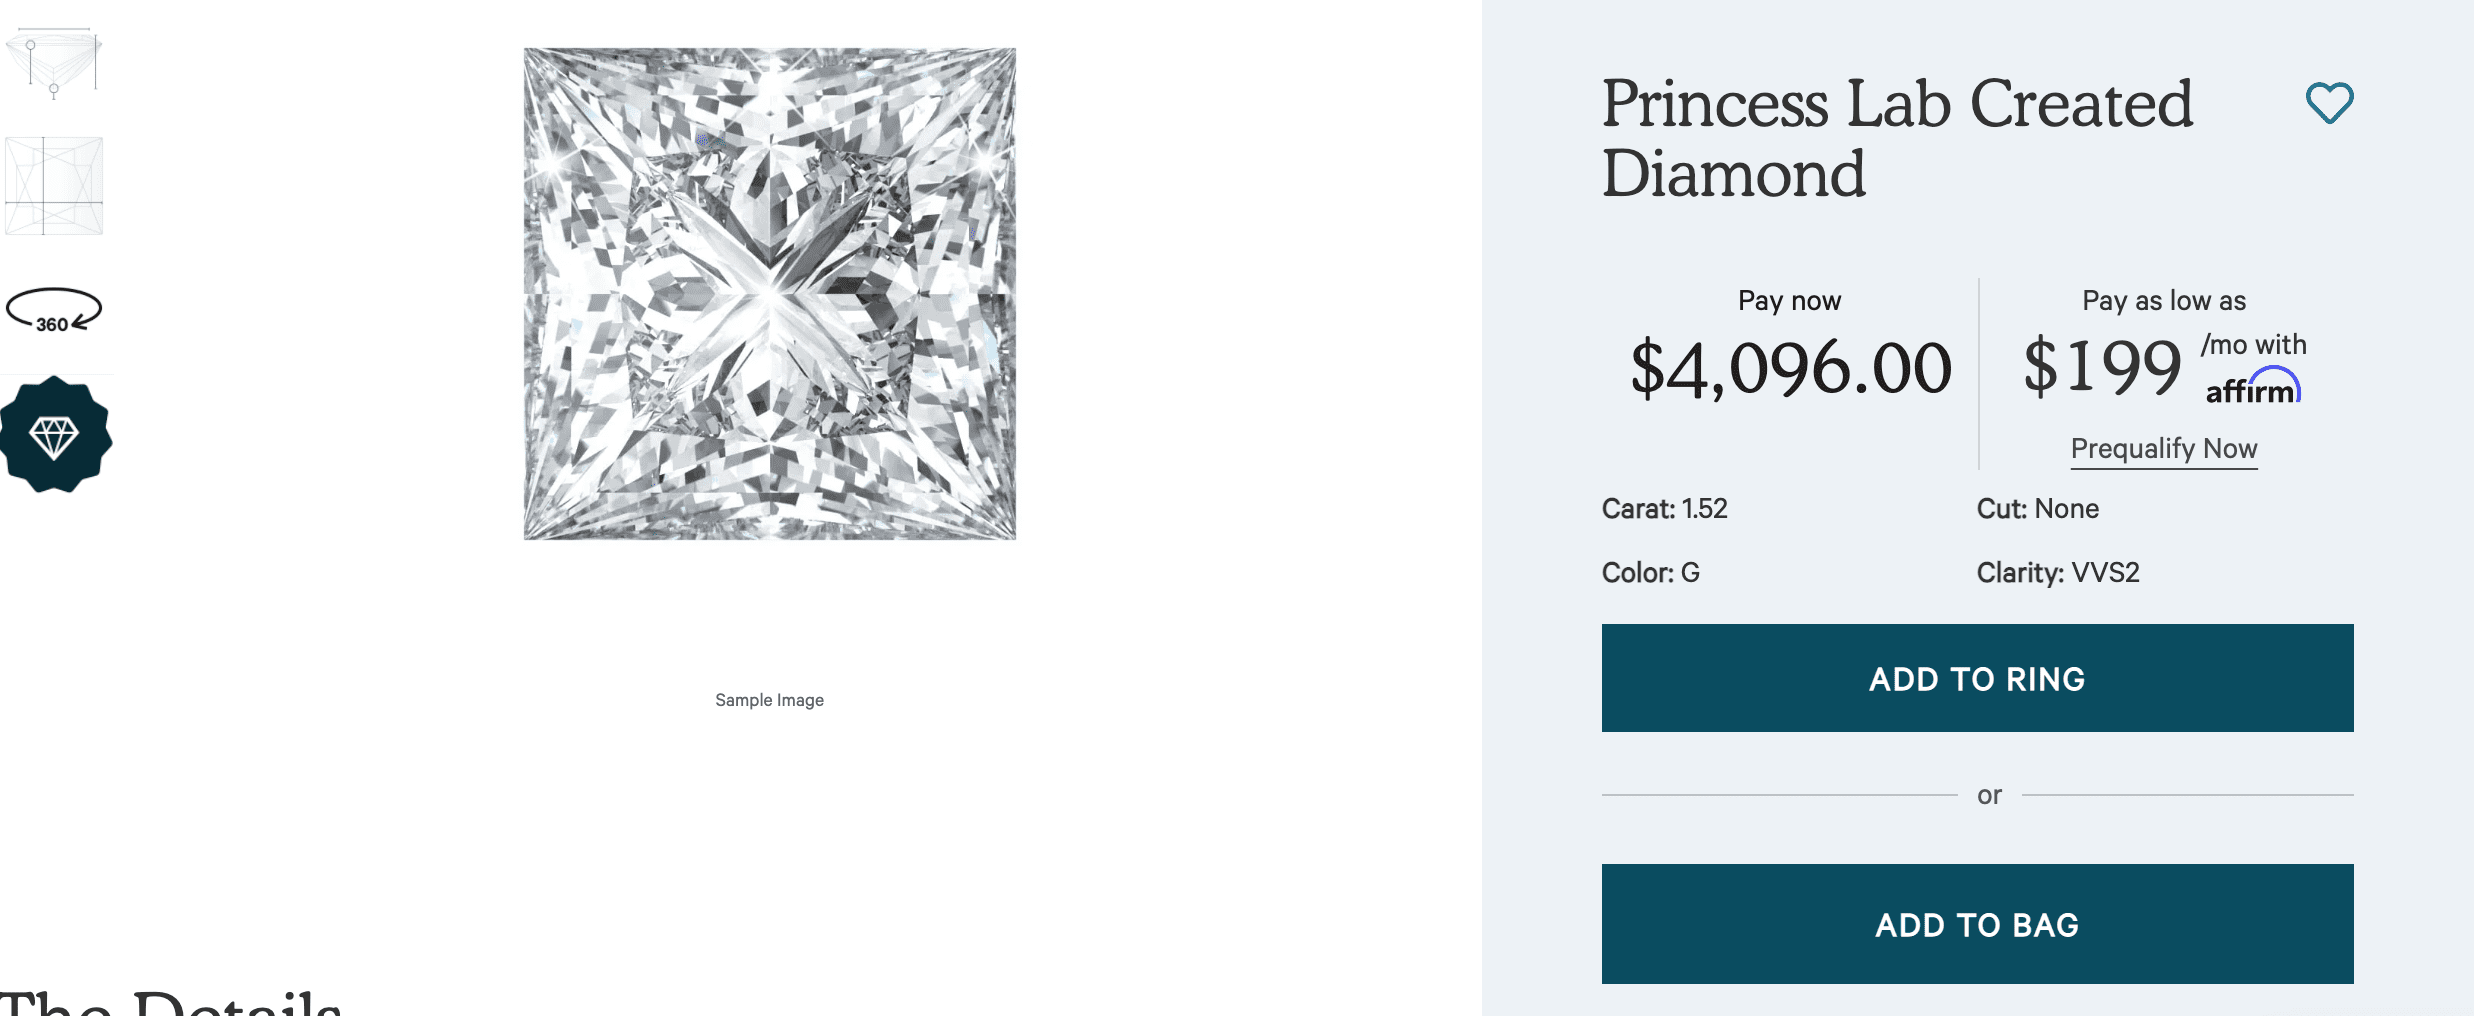 Princess cut lab created diamond